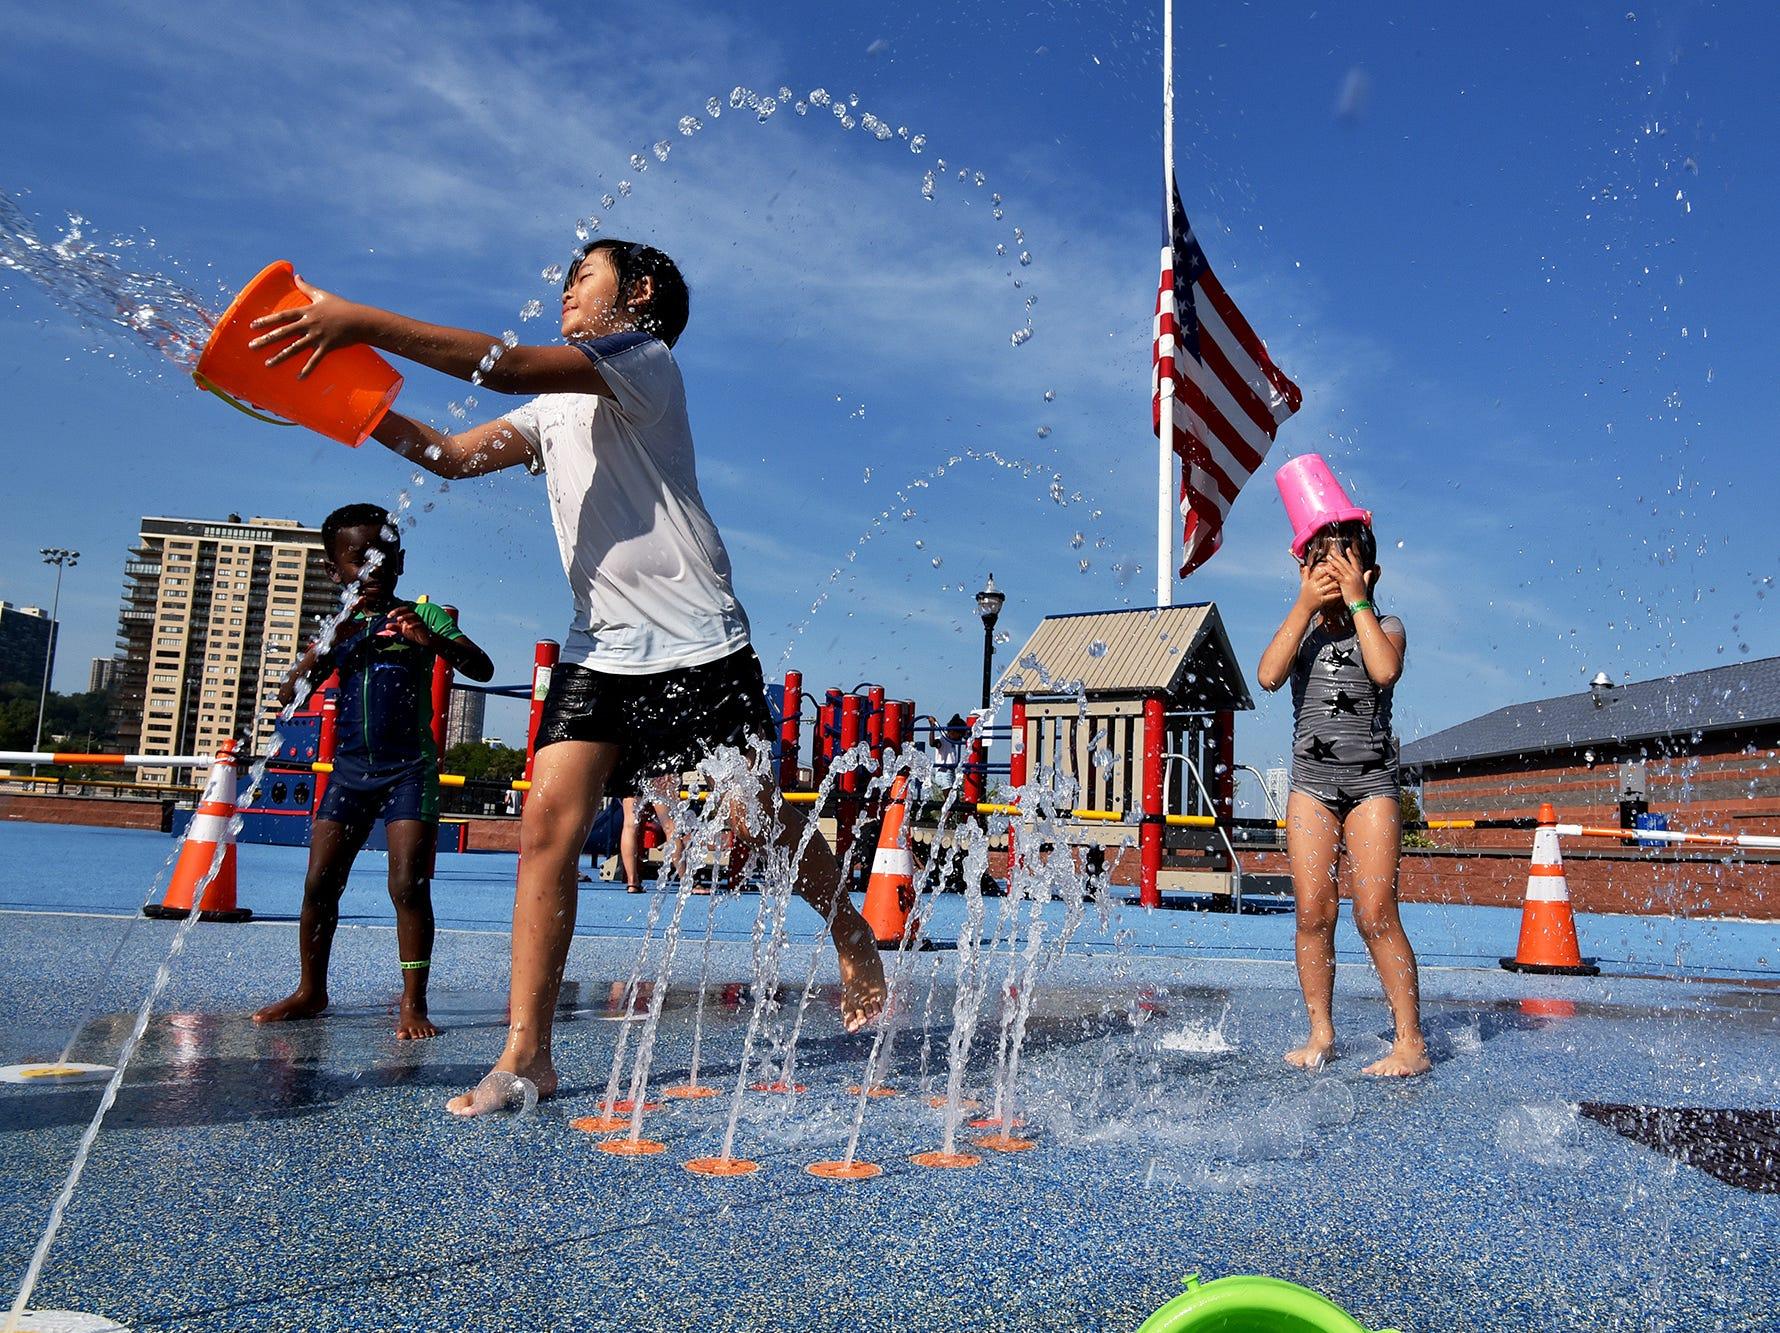 WEATHER Children play at the sprinklers at Veterans Memorial field in Edgewater, NJ.